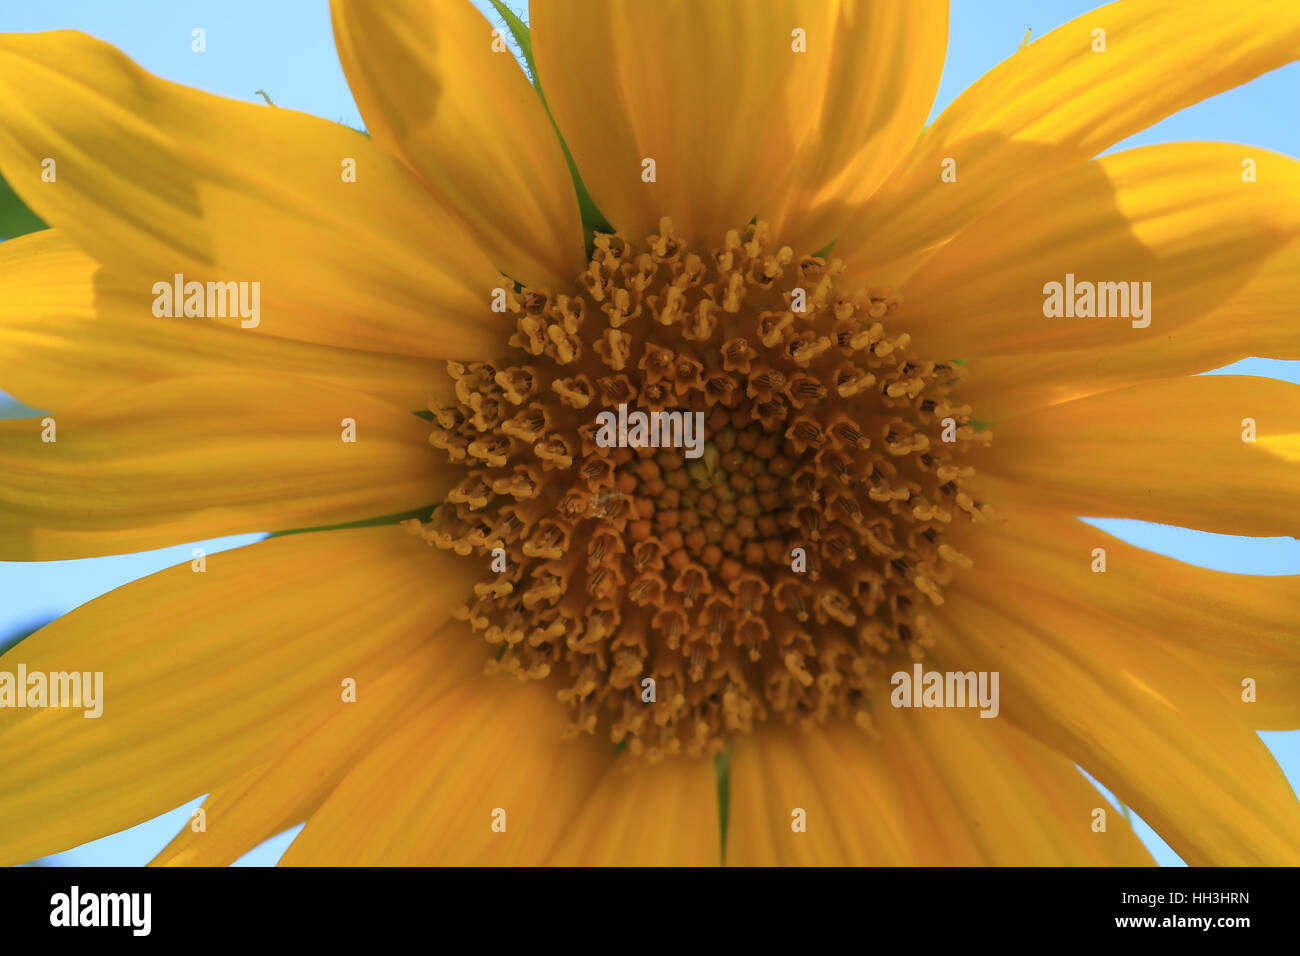 Sonnenblume Blüte - Stock Image